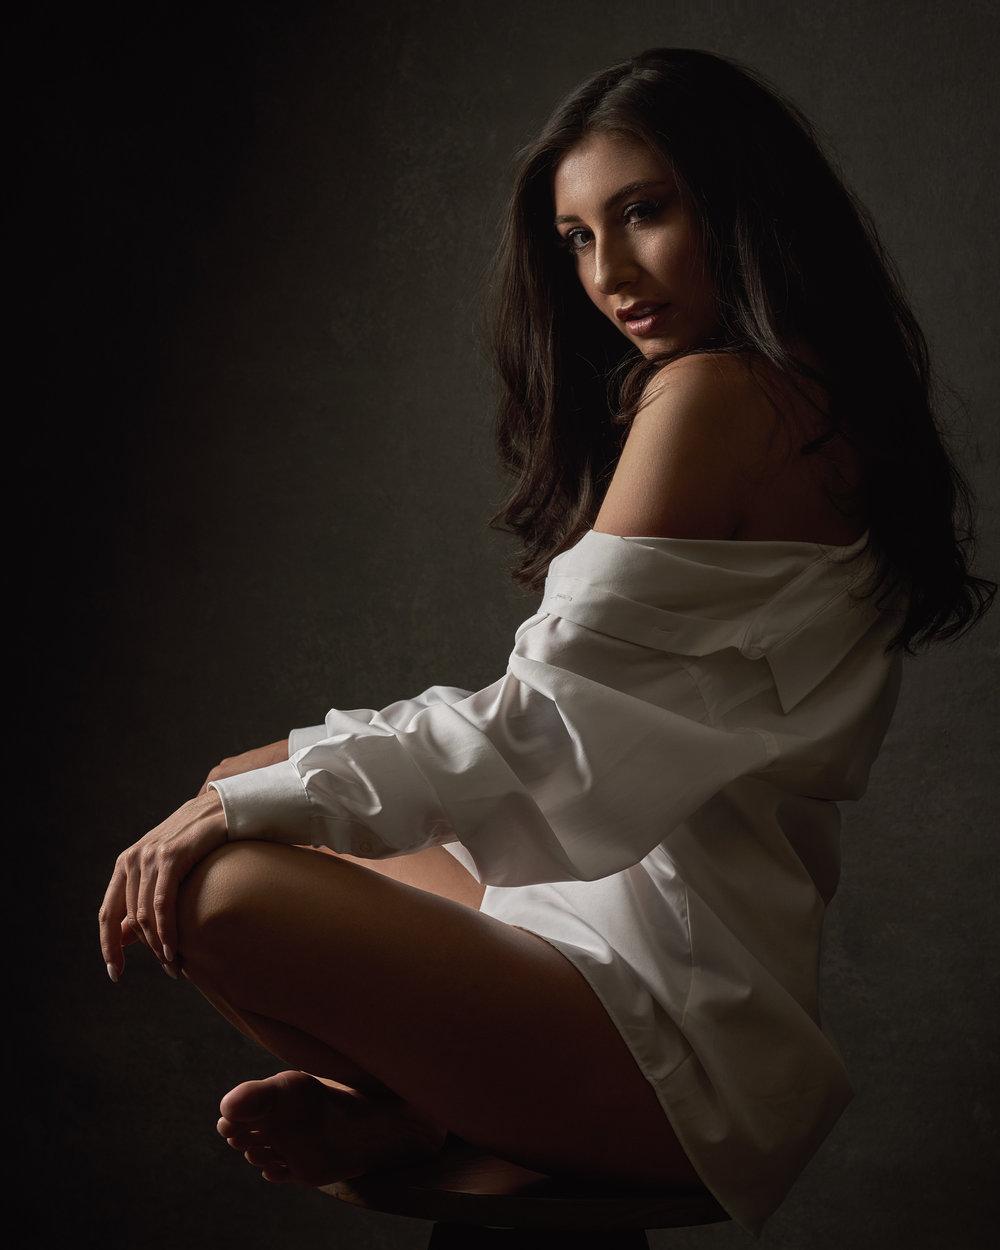 Arizona Fashion Portrait Photographer Chad Weed - Fashion Model Courtney